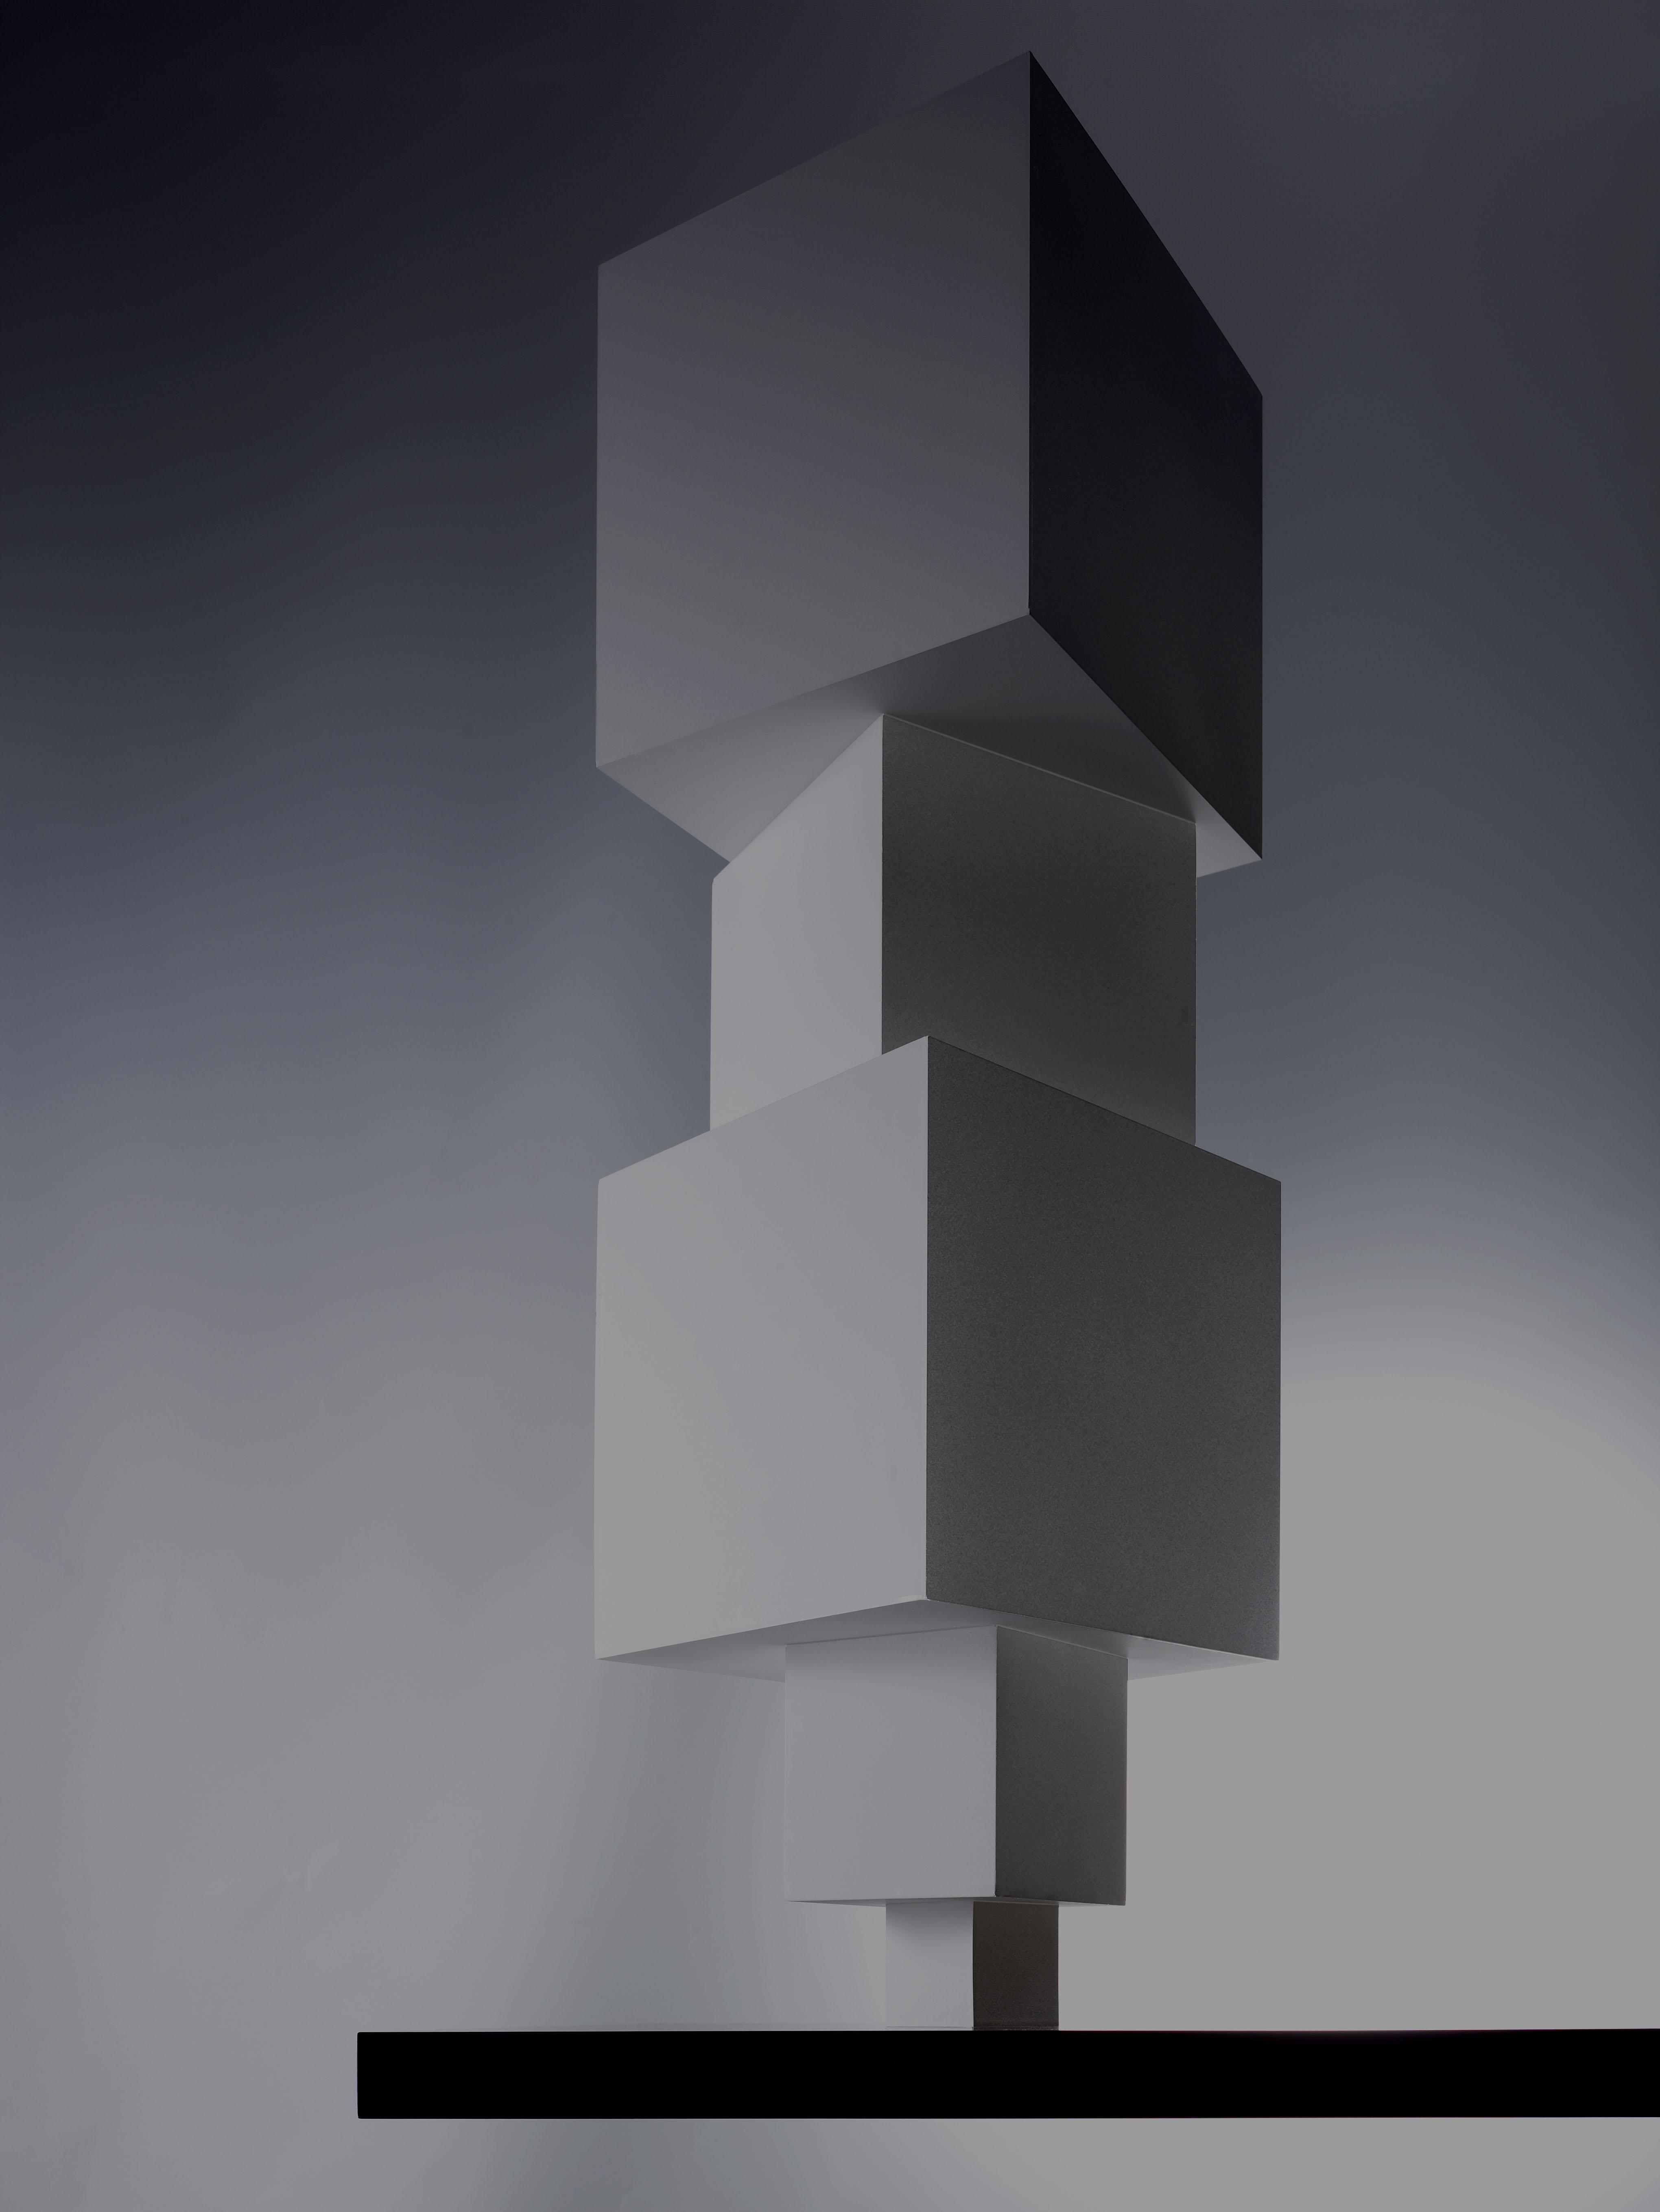 comp-0173_2